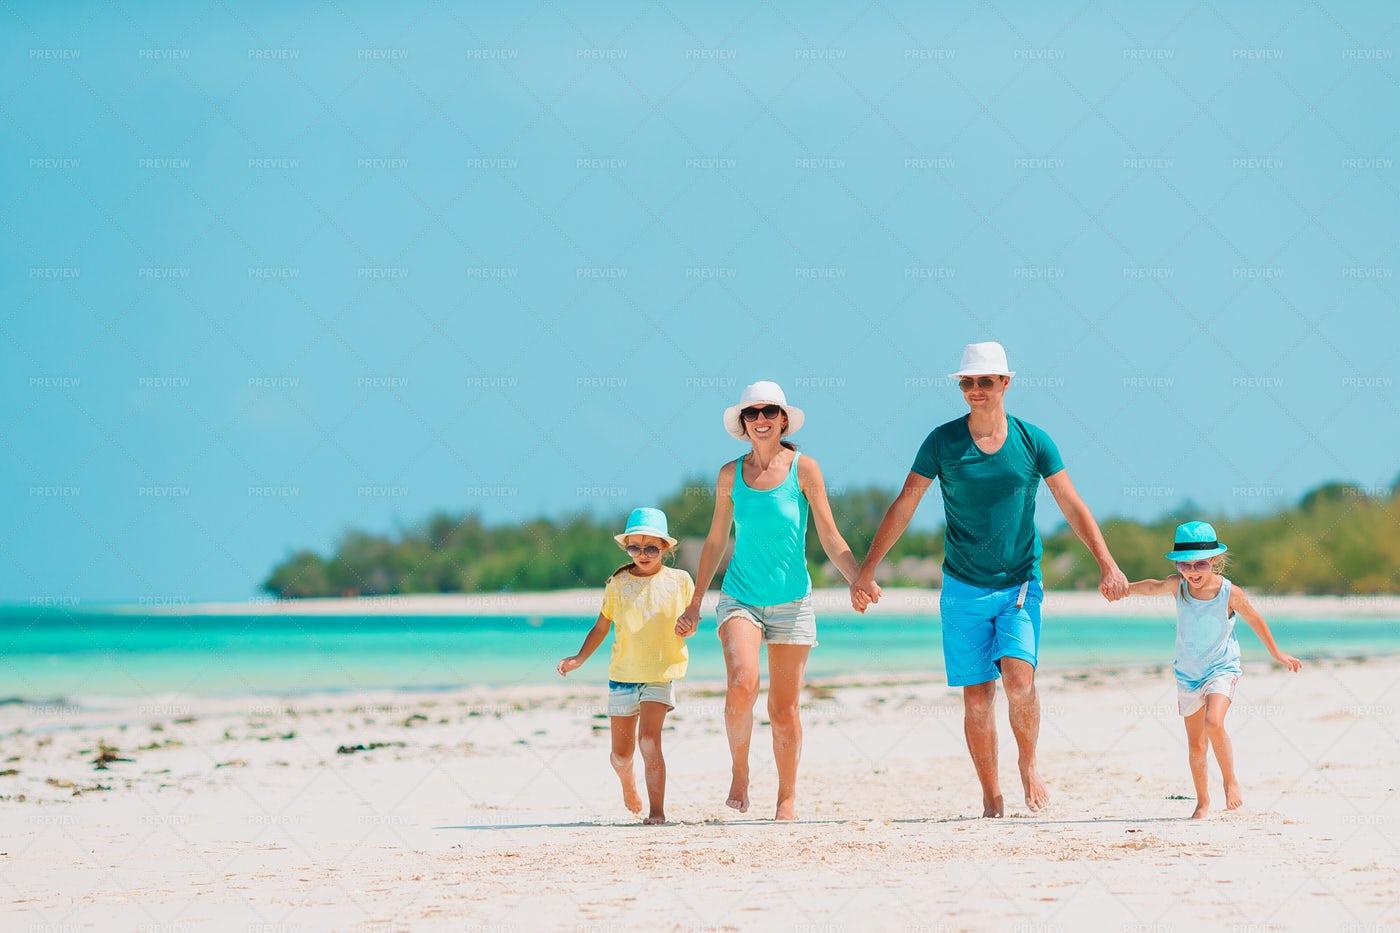 Family Runs On Beach: Stock Photos